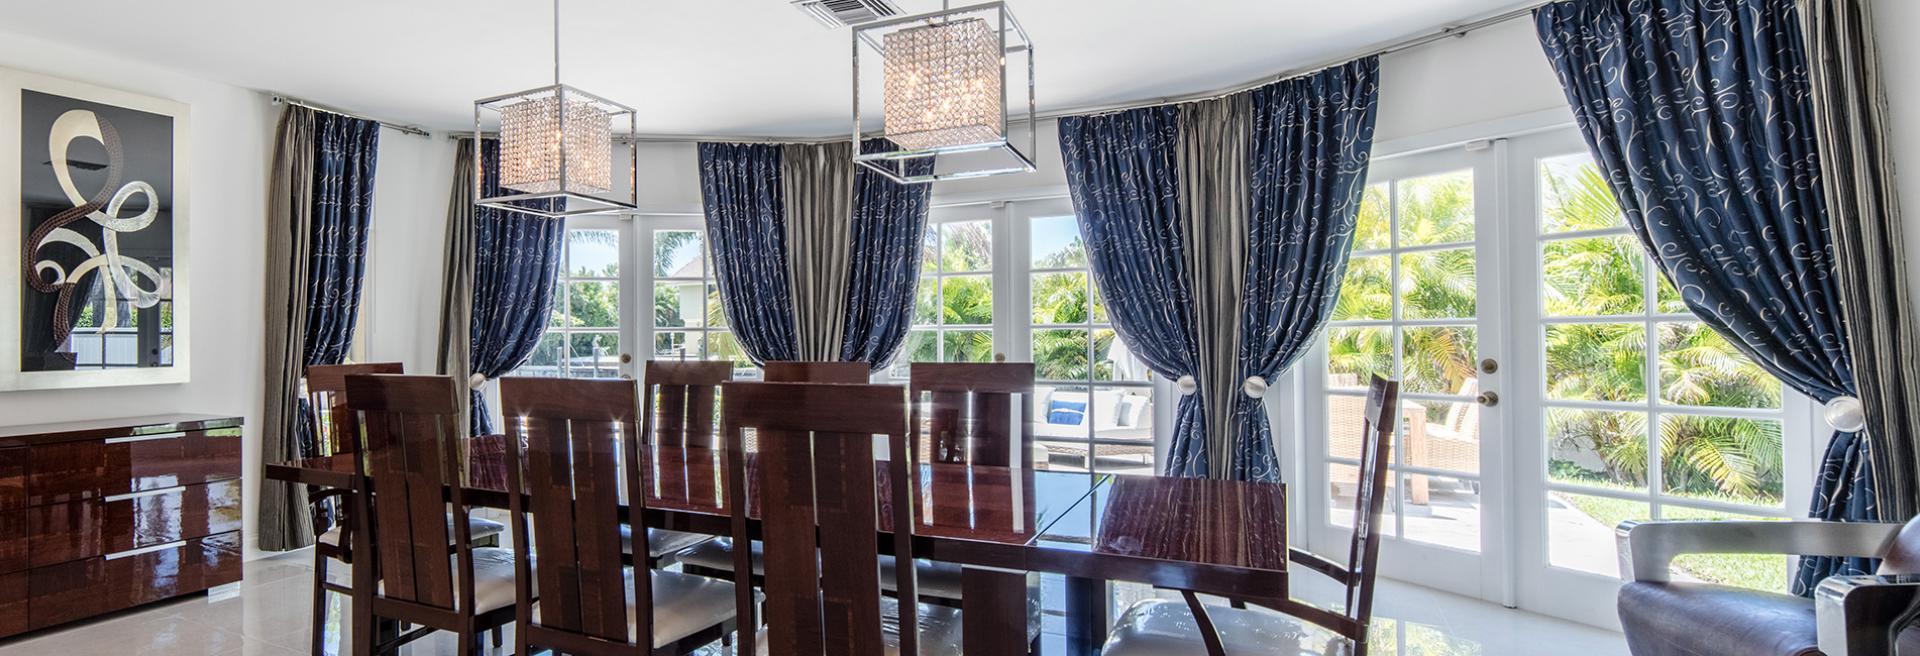 Golden Coast Real Estate - Villa Lara for sale in Delray Florida